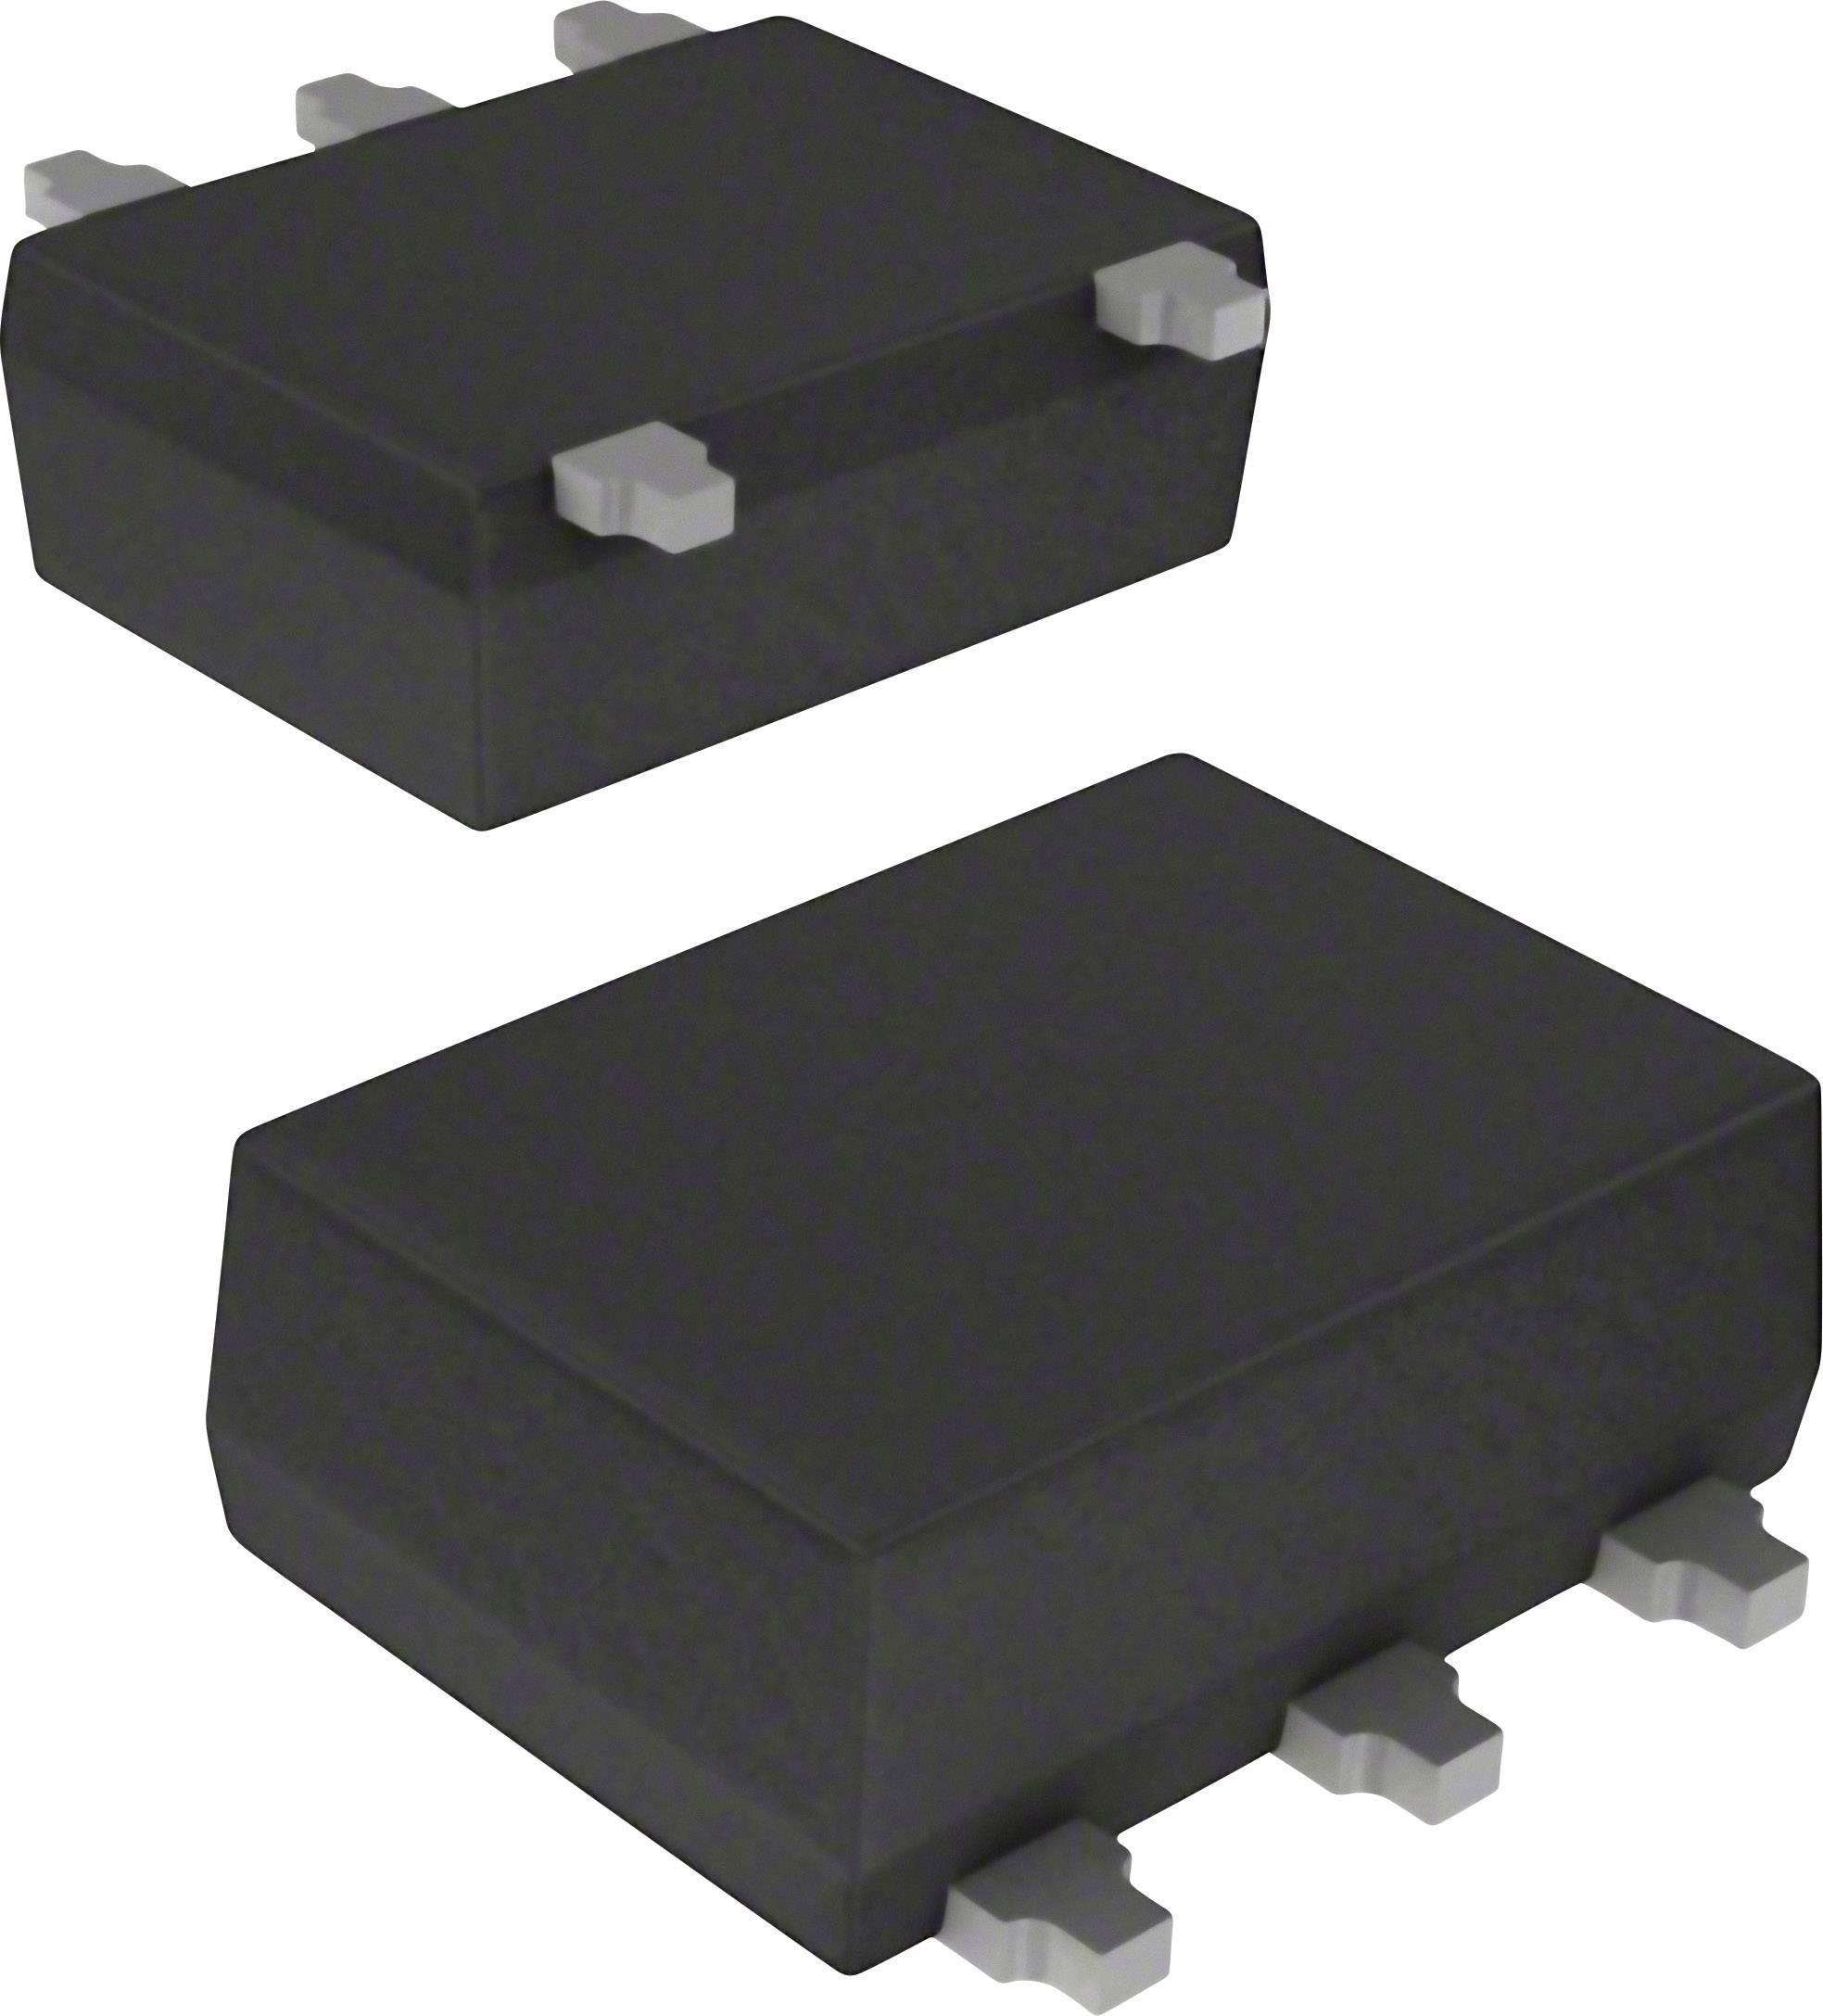 Transil STMicroelectronics QU ESDALC6V1P5 SOT-665 STM